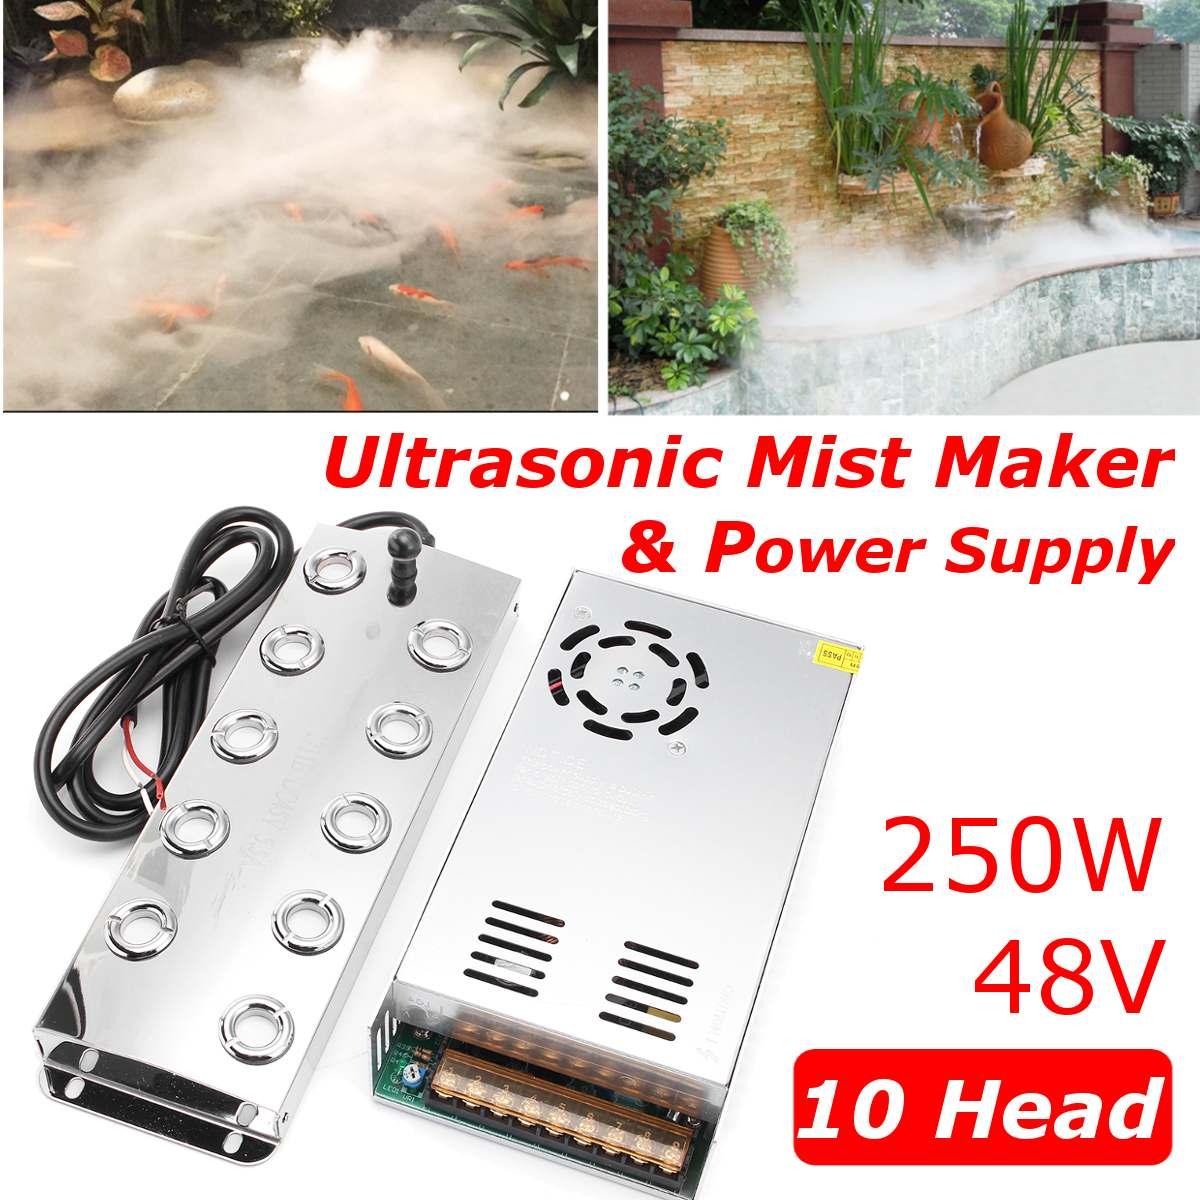 Newest 5000ML/H 10 Head Ultrasonic Mist Maker Fogger Stainless Steel Air Humidifier Greenhouse Aeromist Hydroponics+Transformer